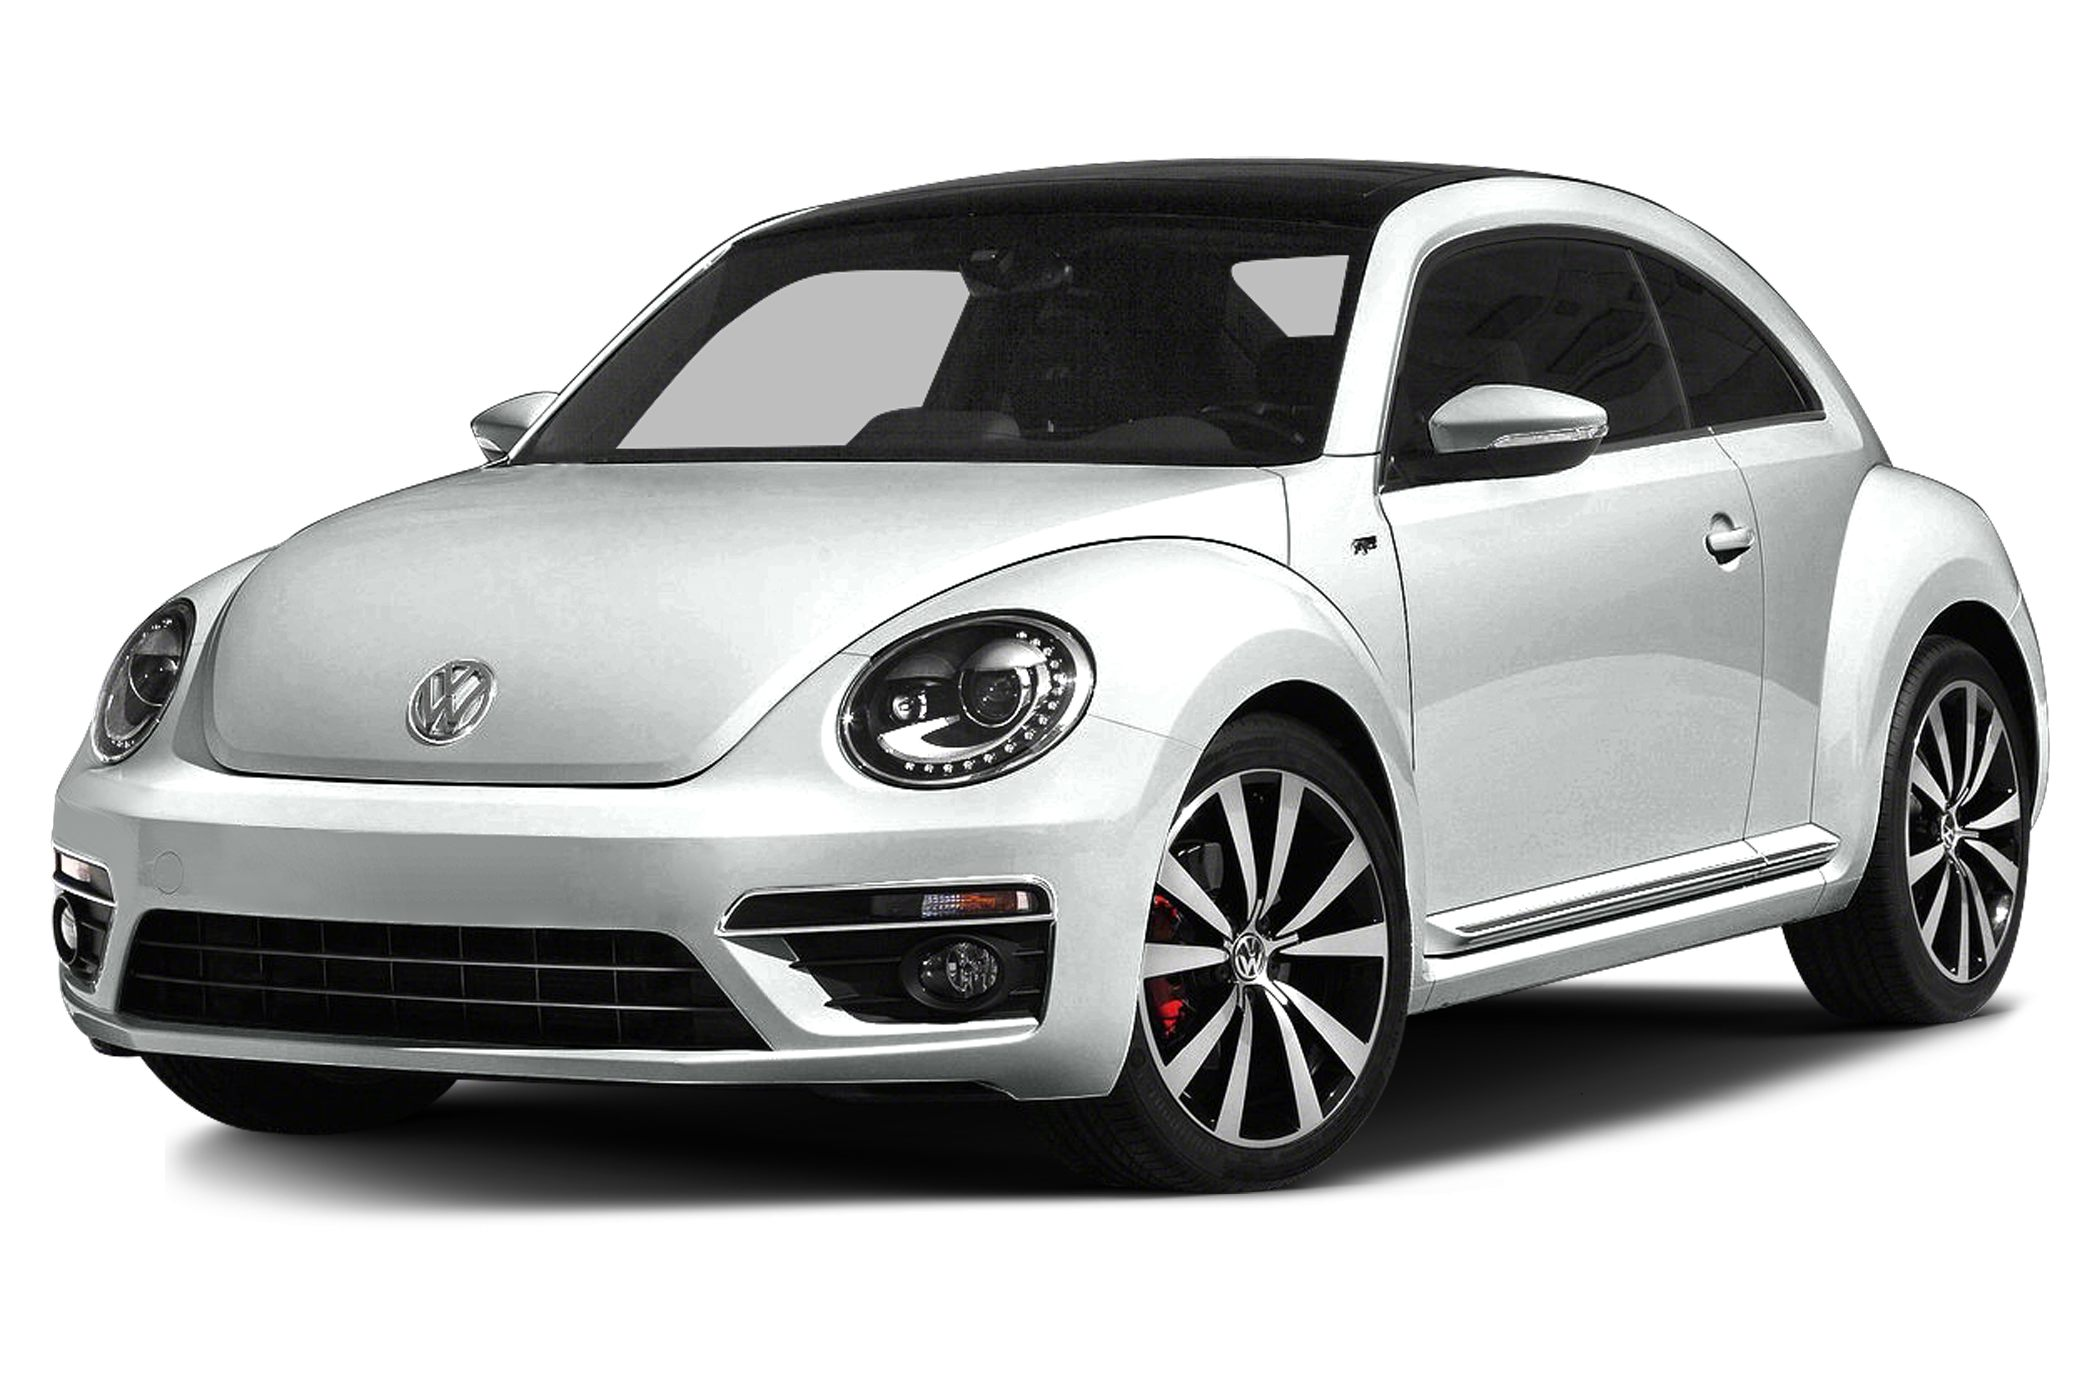 2015 Volkswagen Beetle 2 0t R Line 2dr Hatchback Specs And Prices